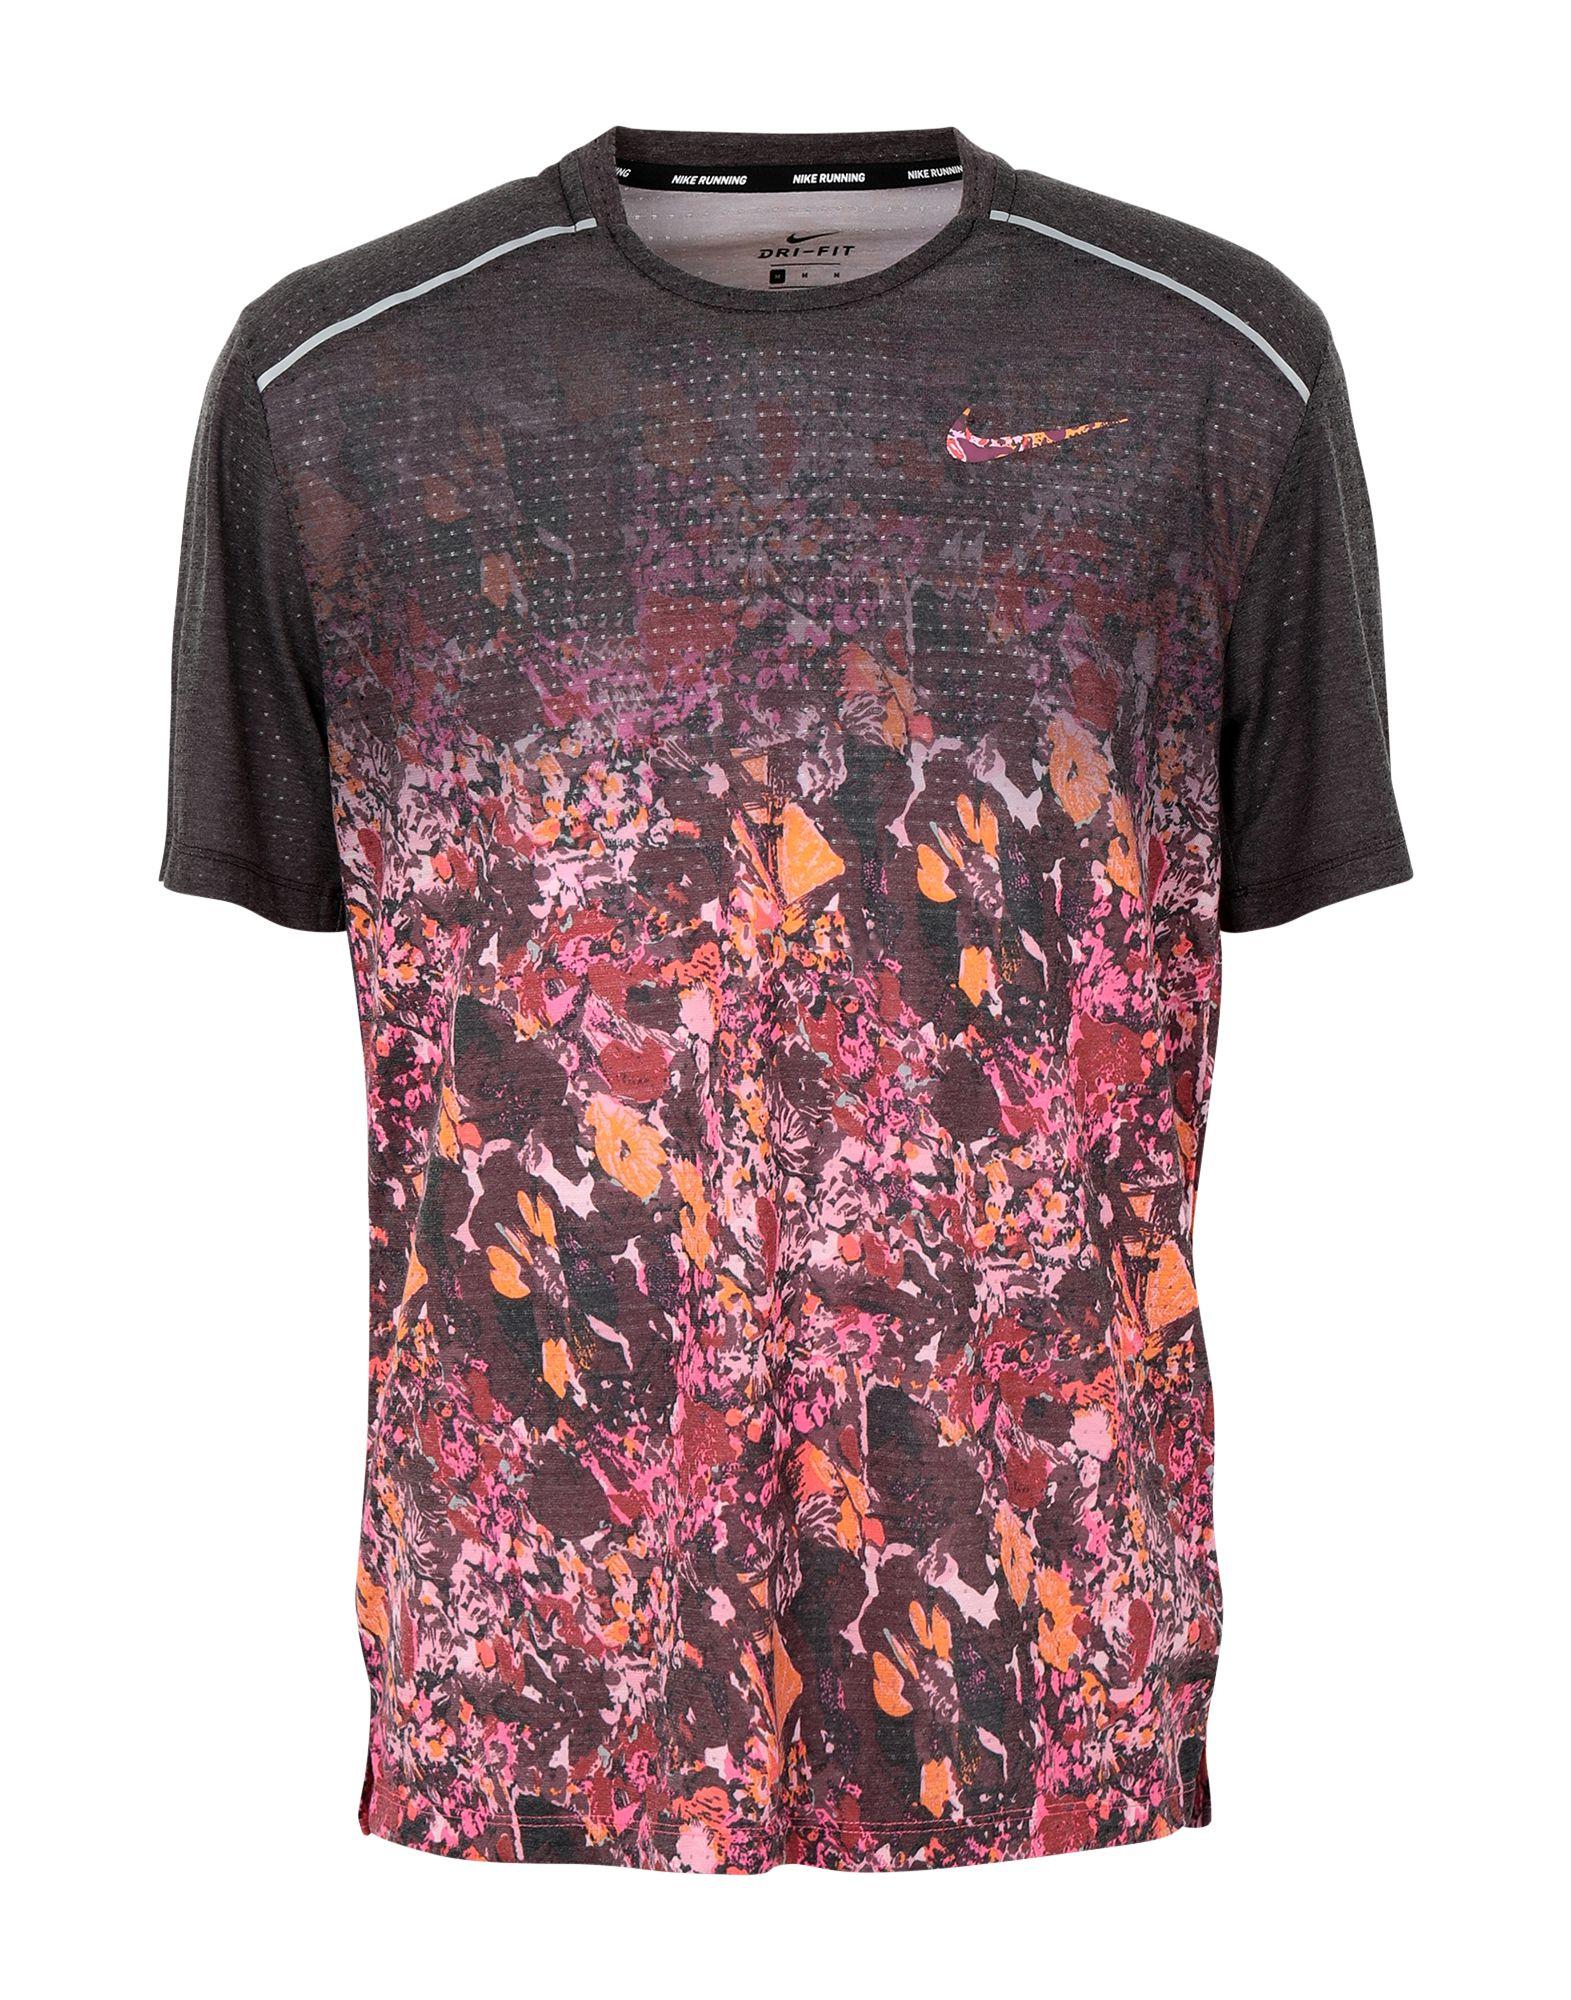 T-Shirt Sportiva Nike Rise 365 Short Sleeve Top Premium - herren - 12350961EN